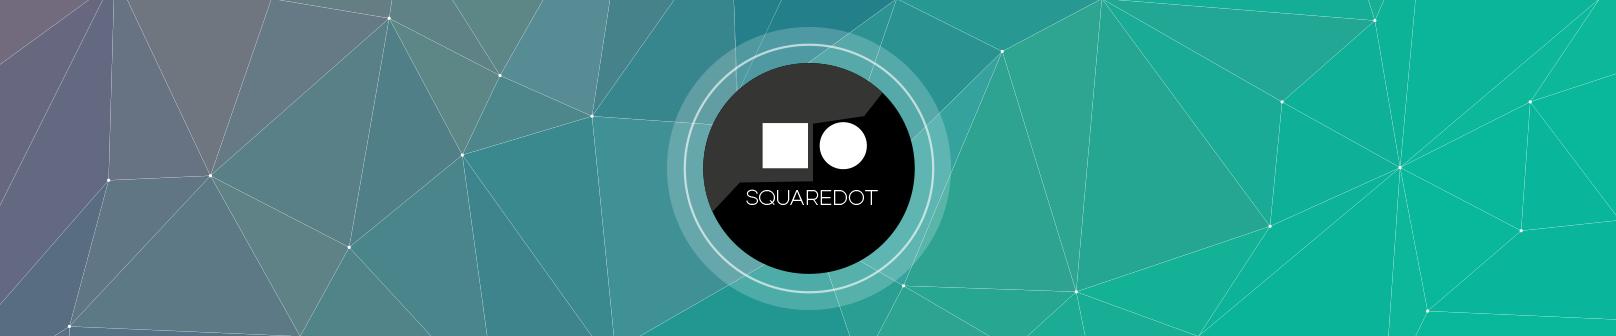 Squaredot B2B Content Strategy